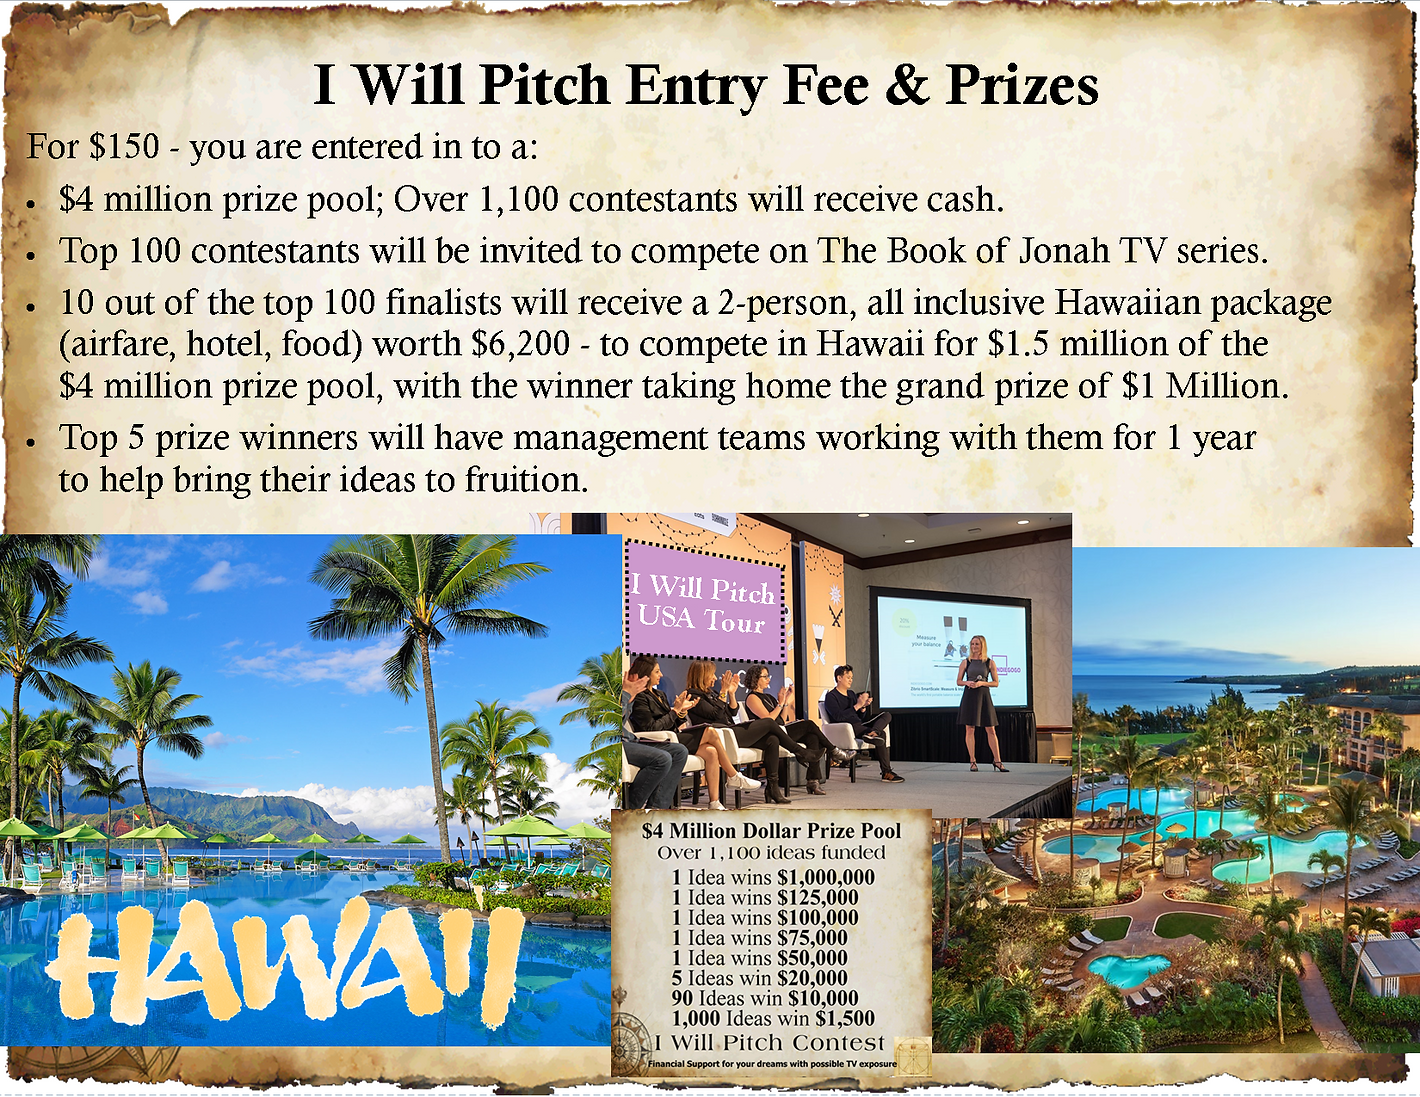 hawaii 2.png